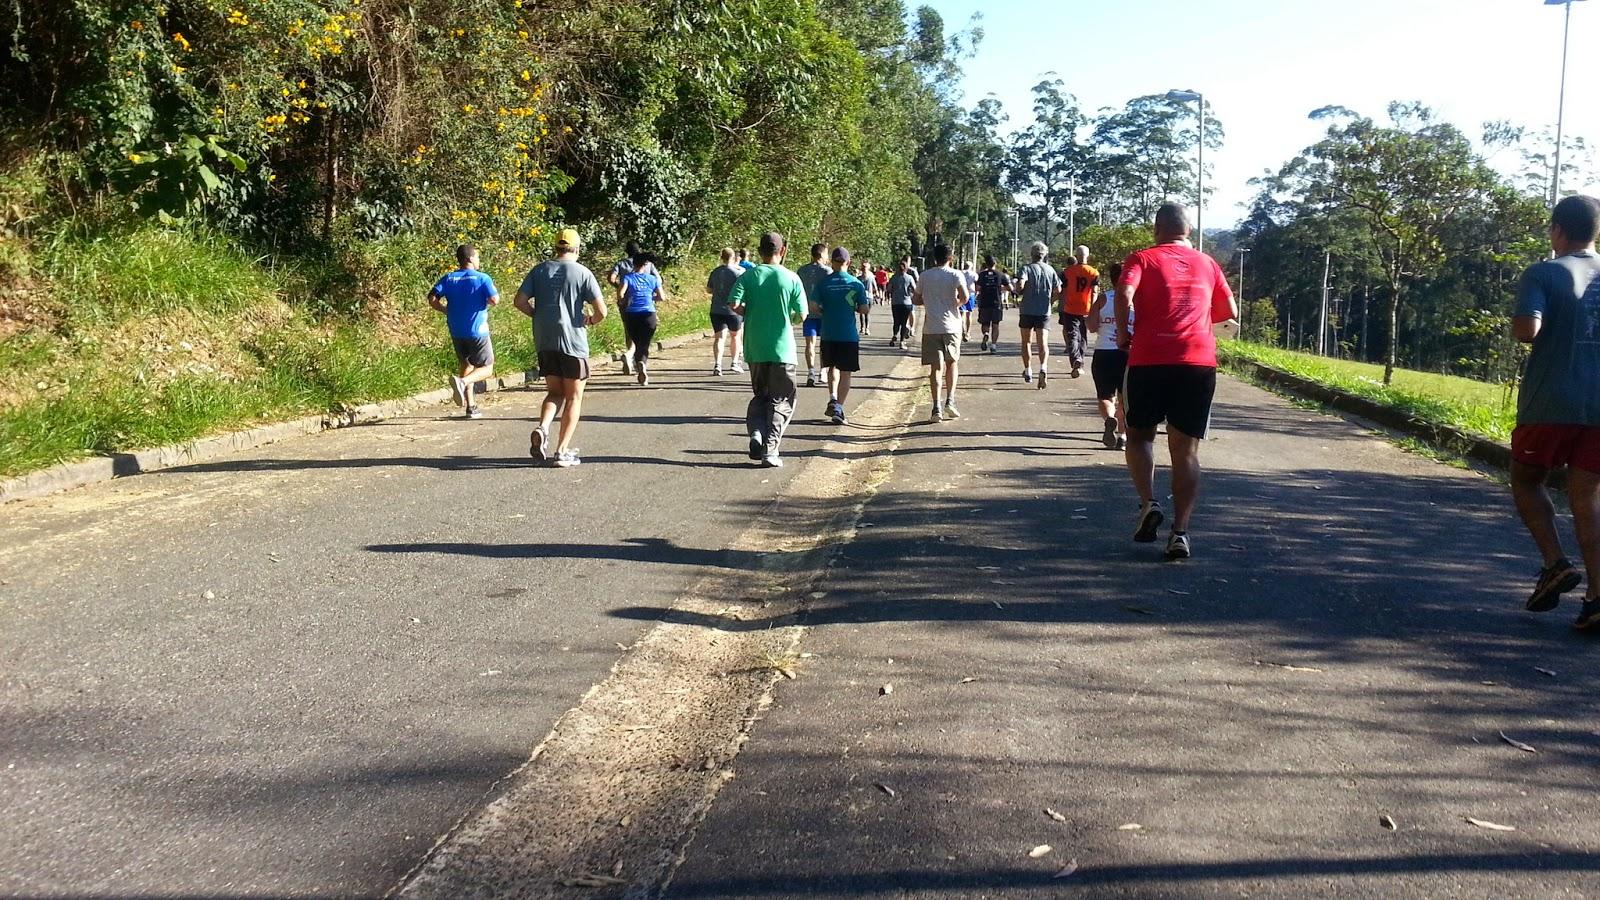 Corrida do Trabalhador 2014 - Parque do Carmo - Corrida de Rua